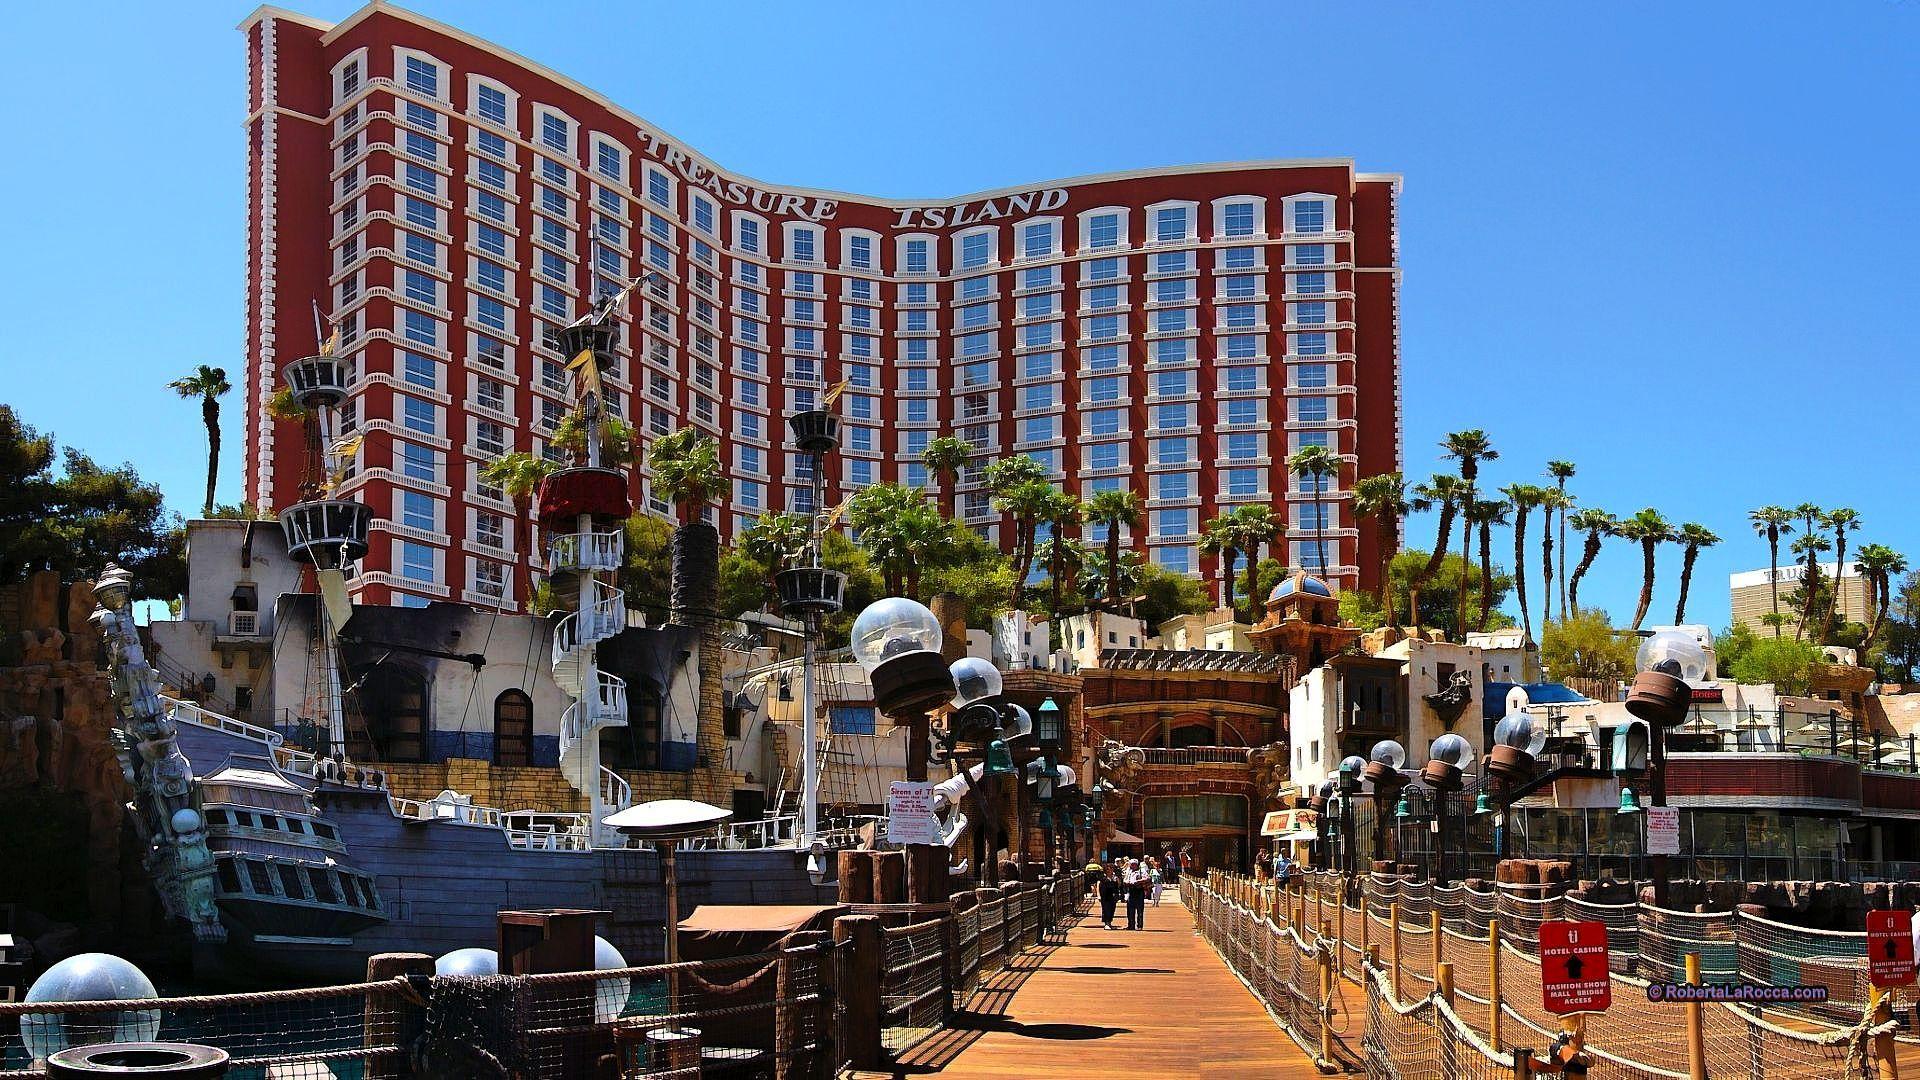 Top ranked las vegas casino hotels who has made money gambling